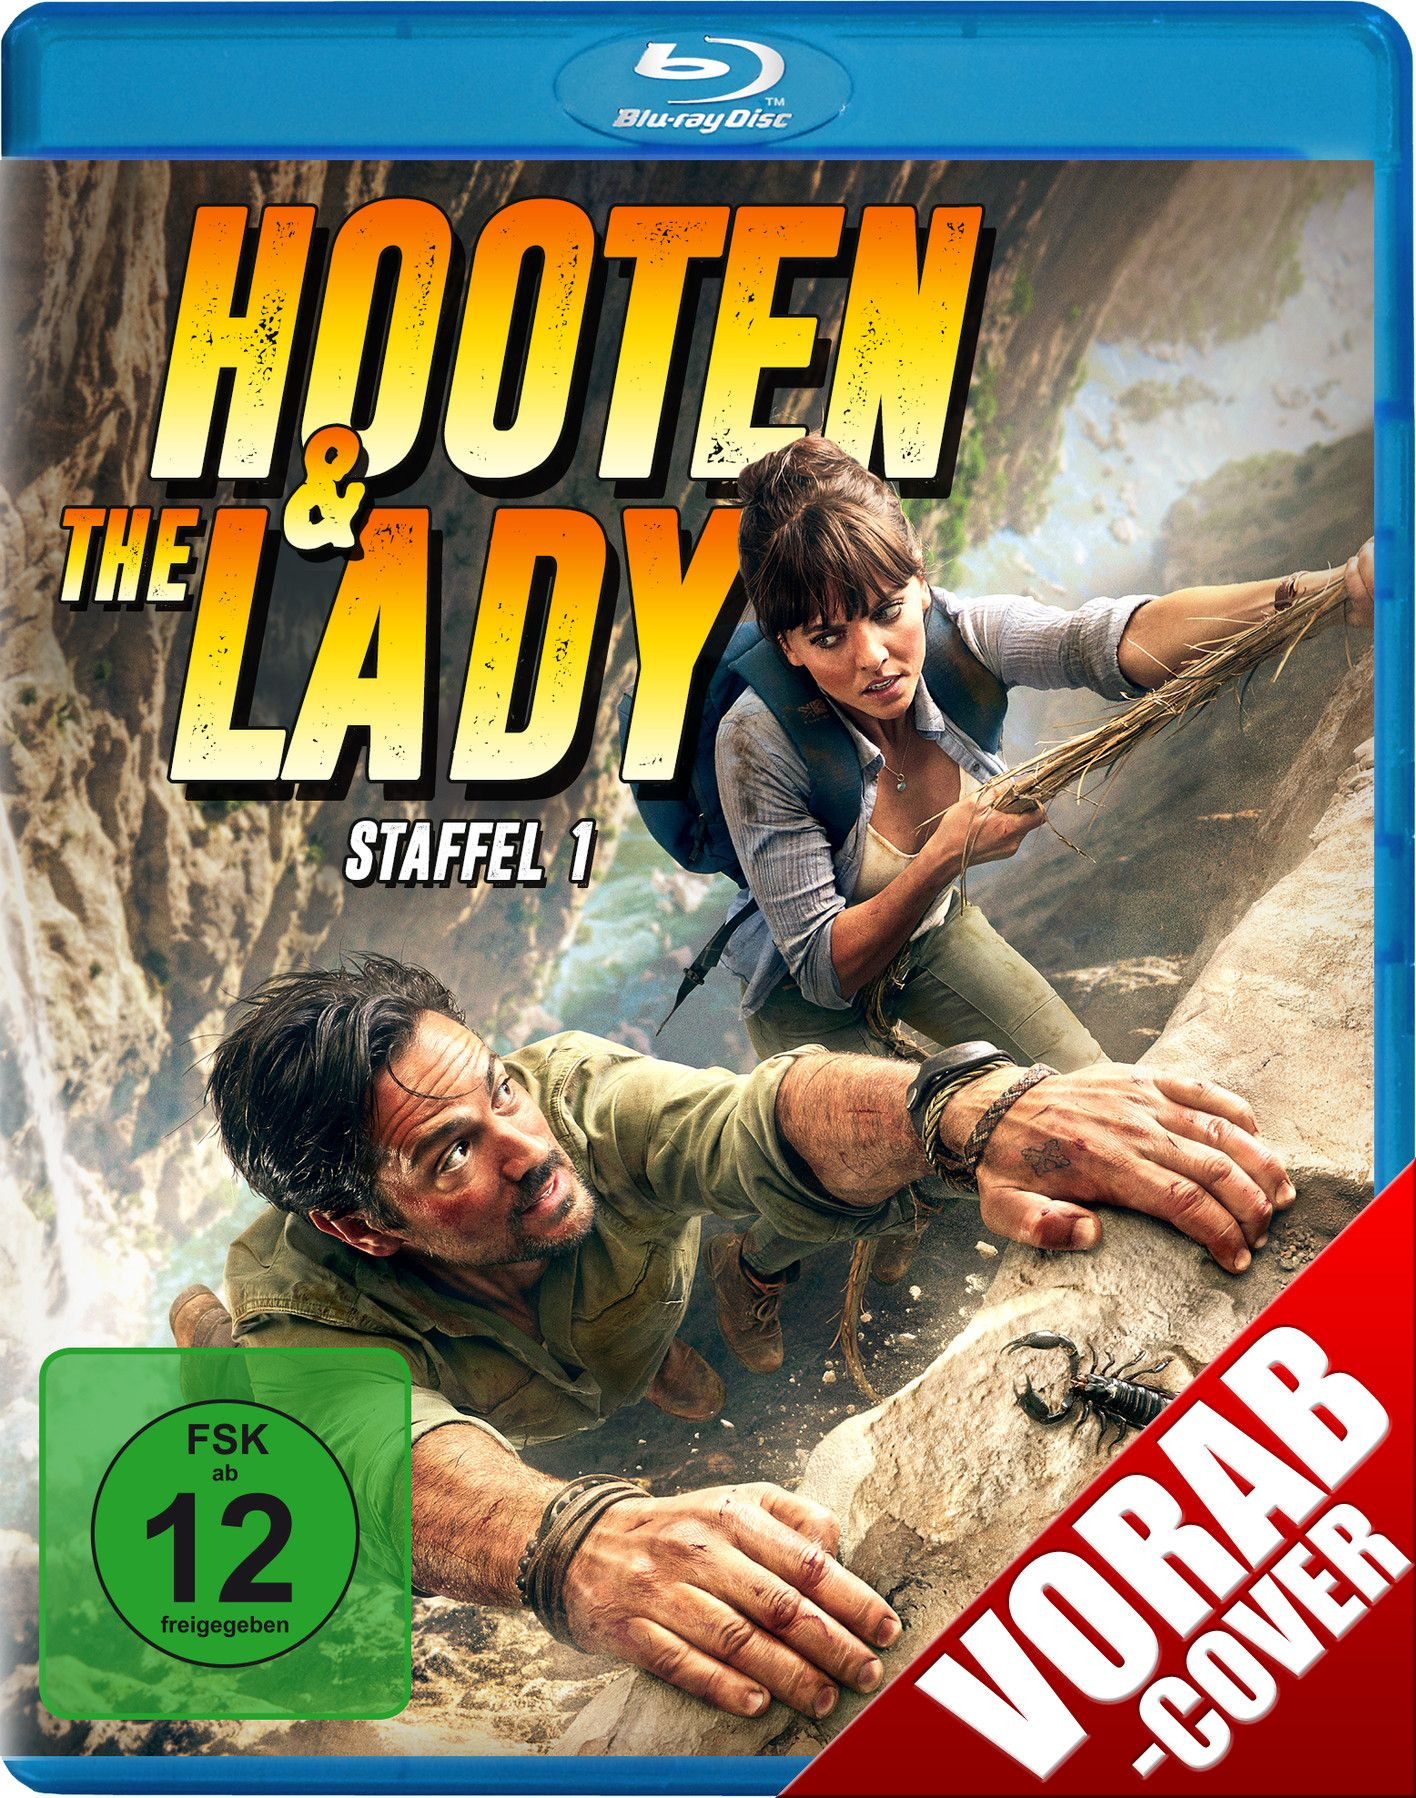 Hooten & the Lady - Staffel 1 (2 Discs) (BLURAY)